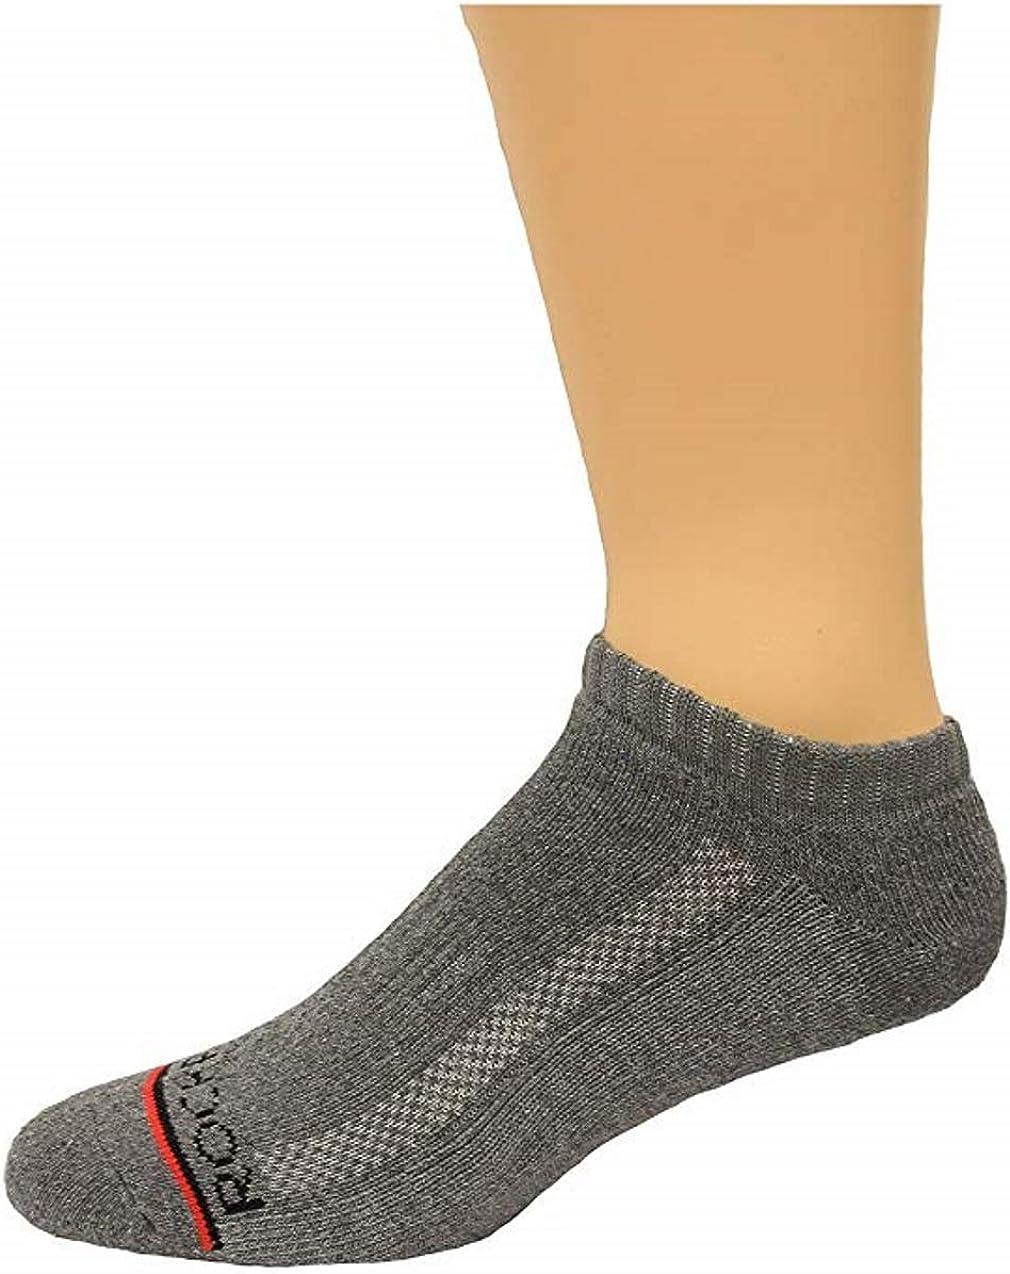 Rockport Men's No Show Socks 4 Pair, Grey, Men's 8-12